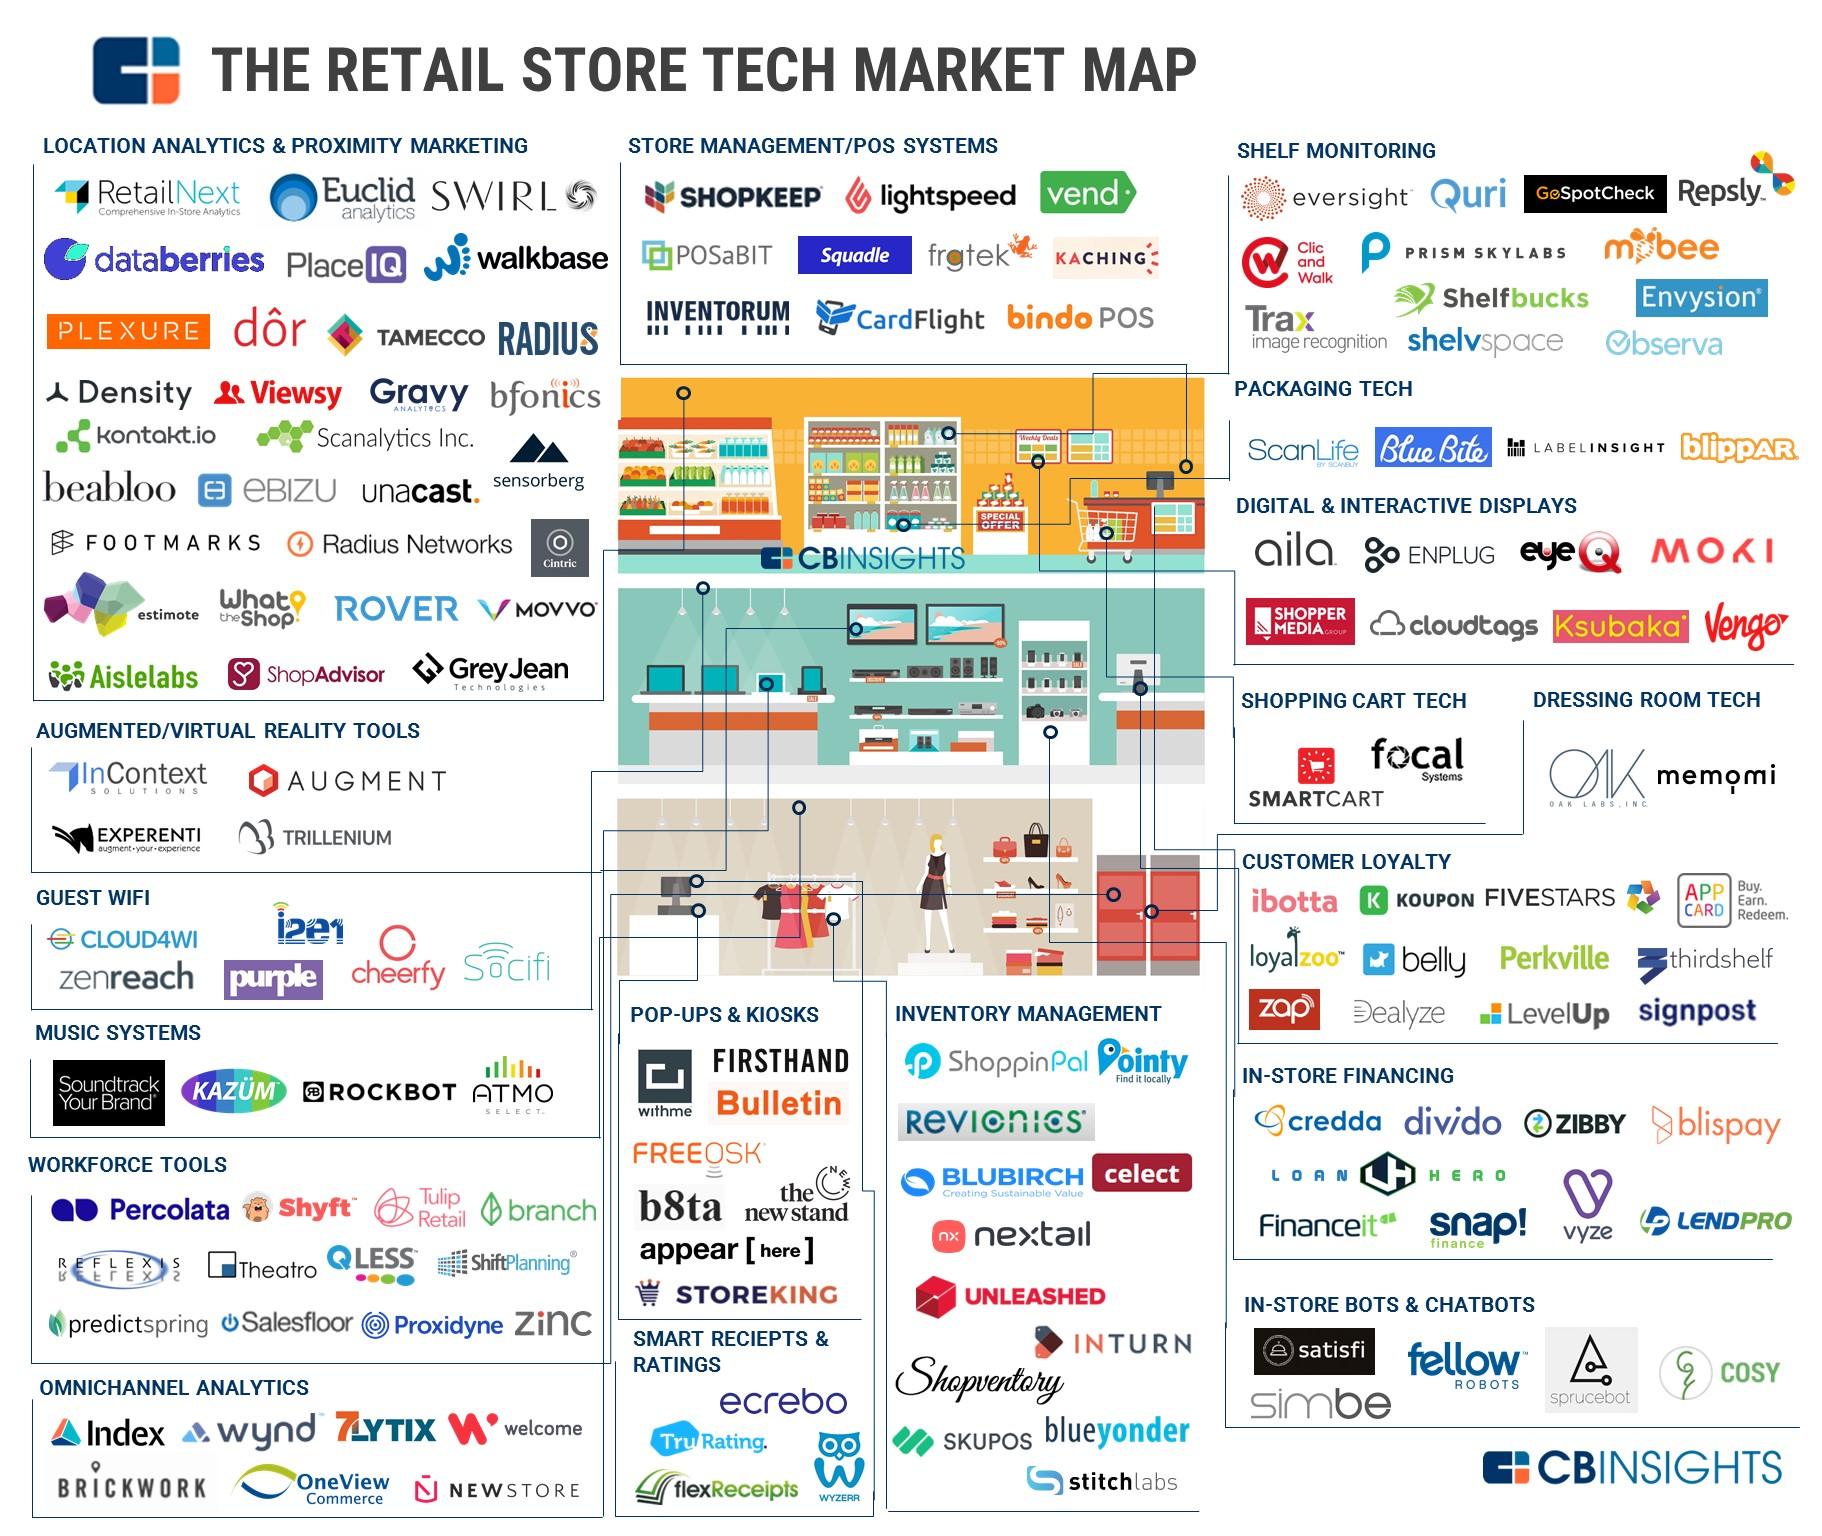 The retail store tech market map